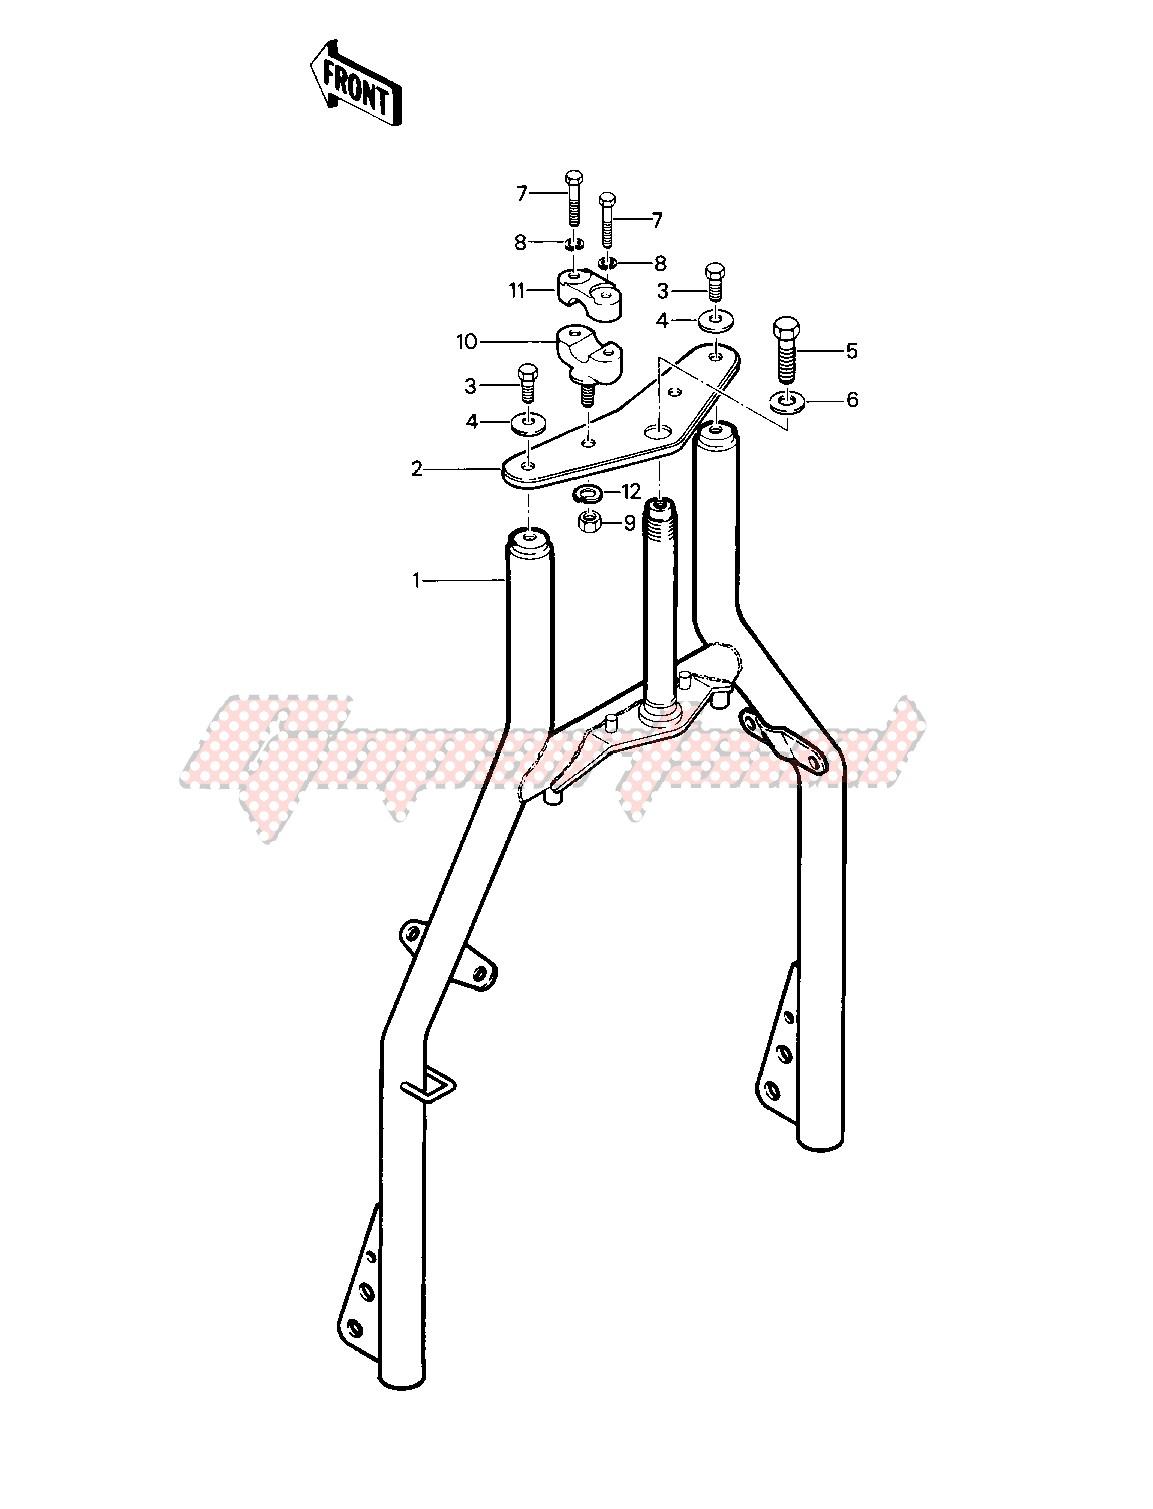 FRONT FORK -- 81-82 KLT200-A1_A2_A3- - image